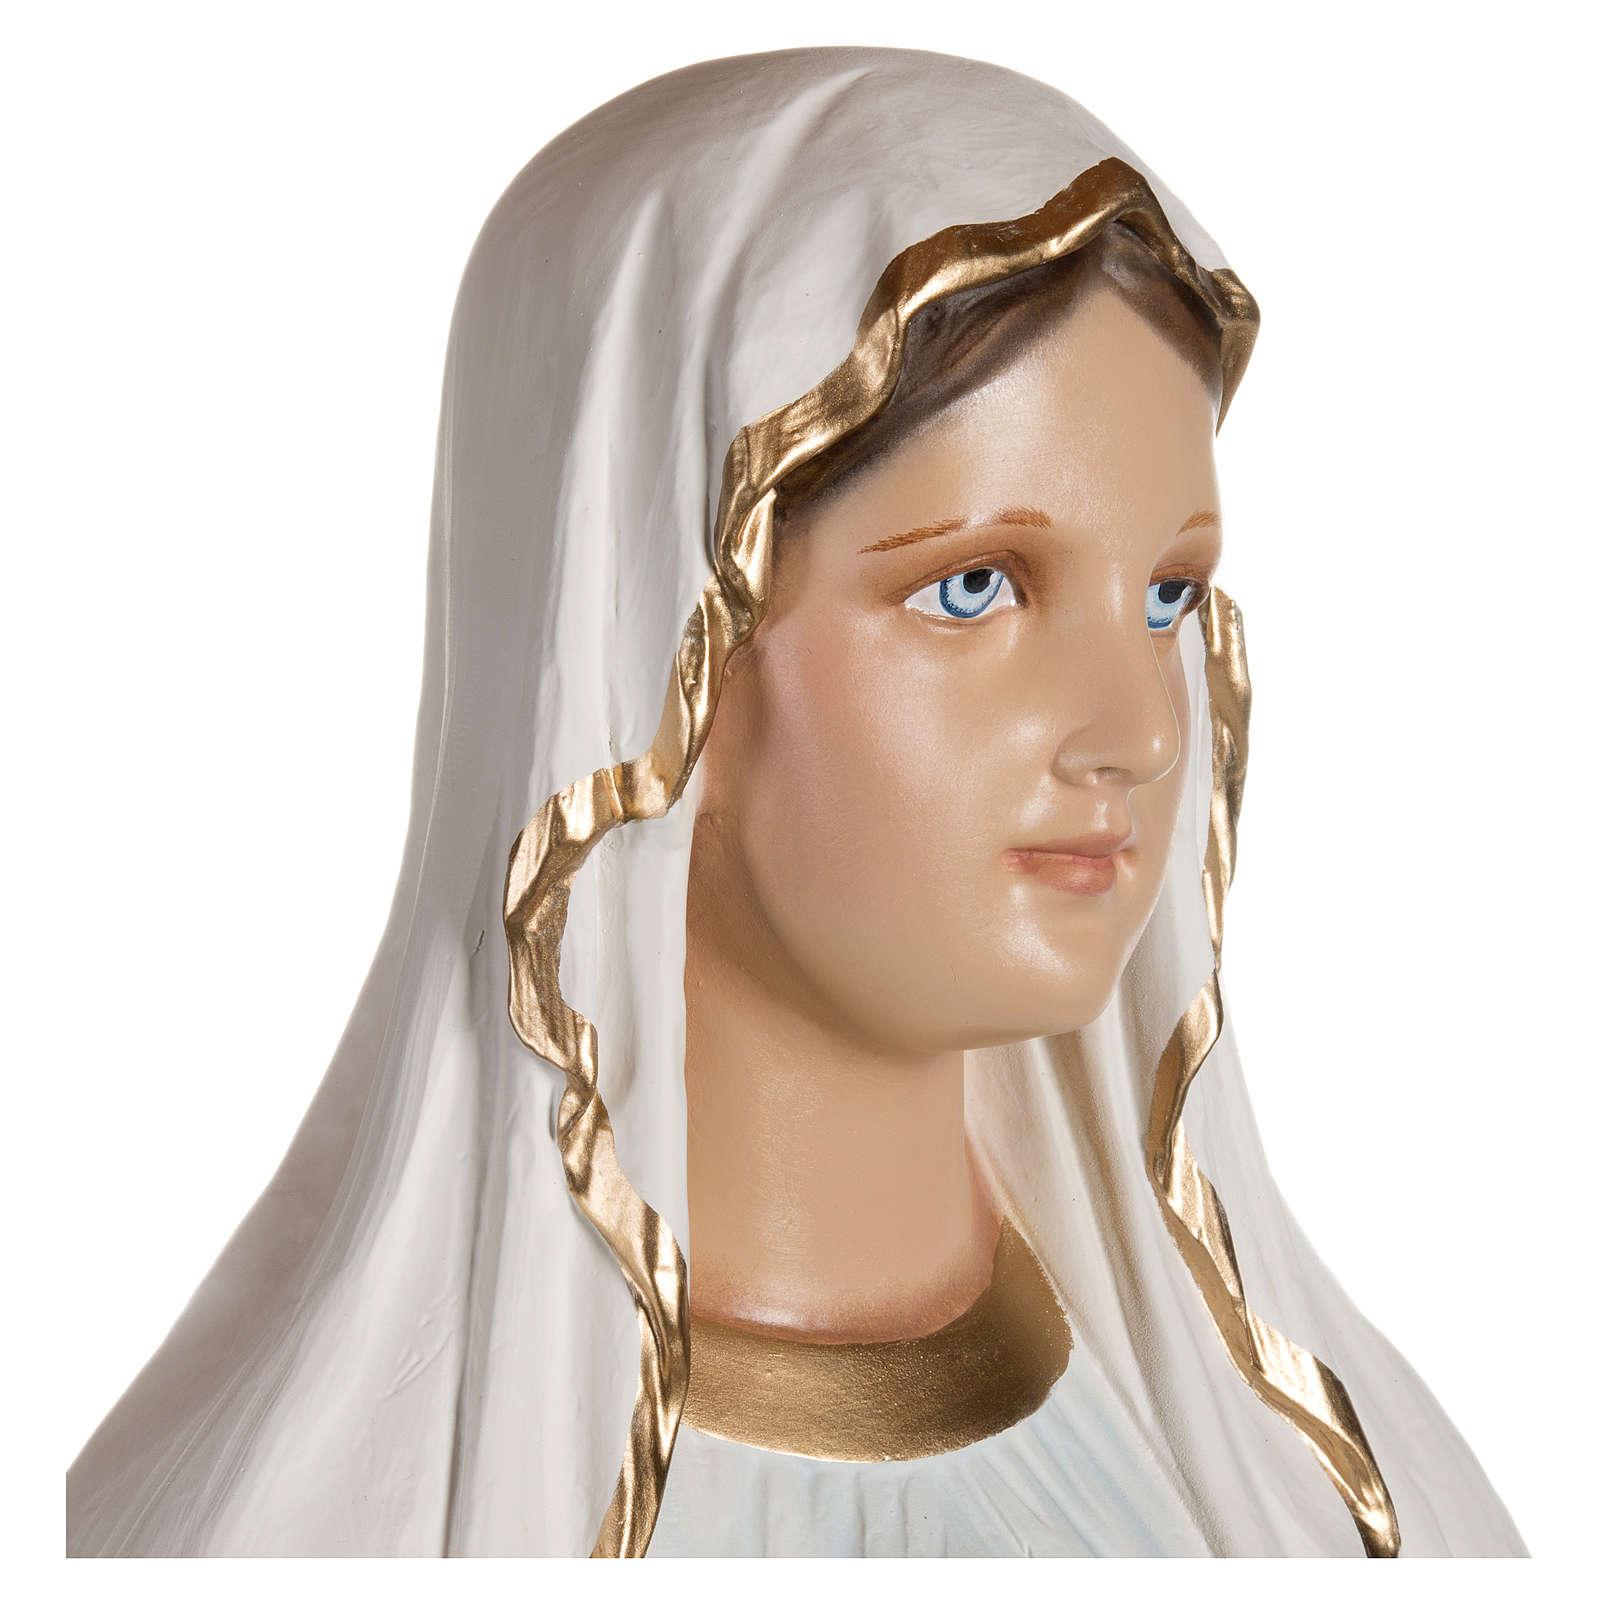 Estatua Virgen de Lourdes fibra de vidrio 130 cm PARA EXTERIOR 4